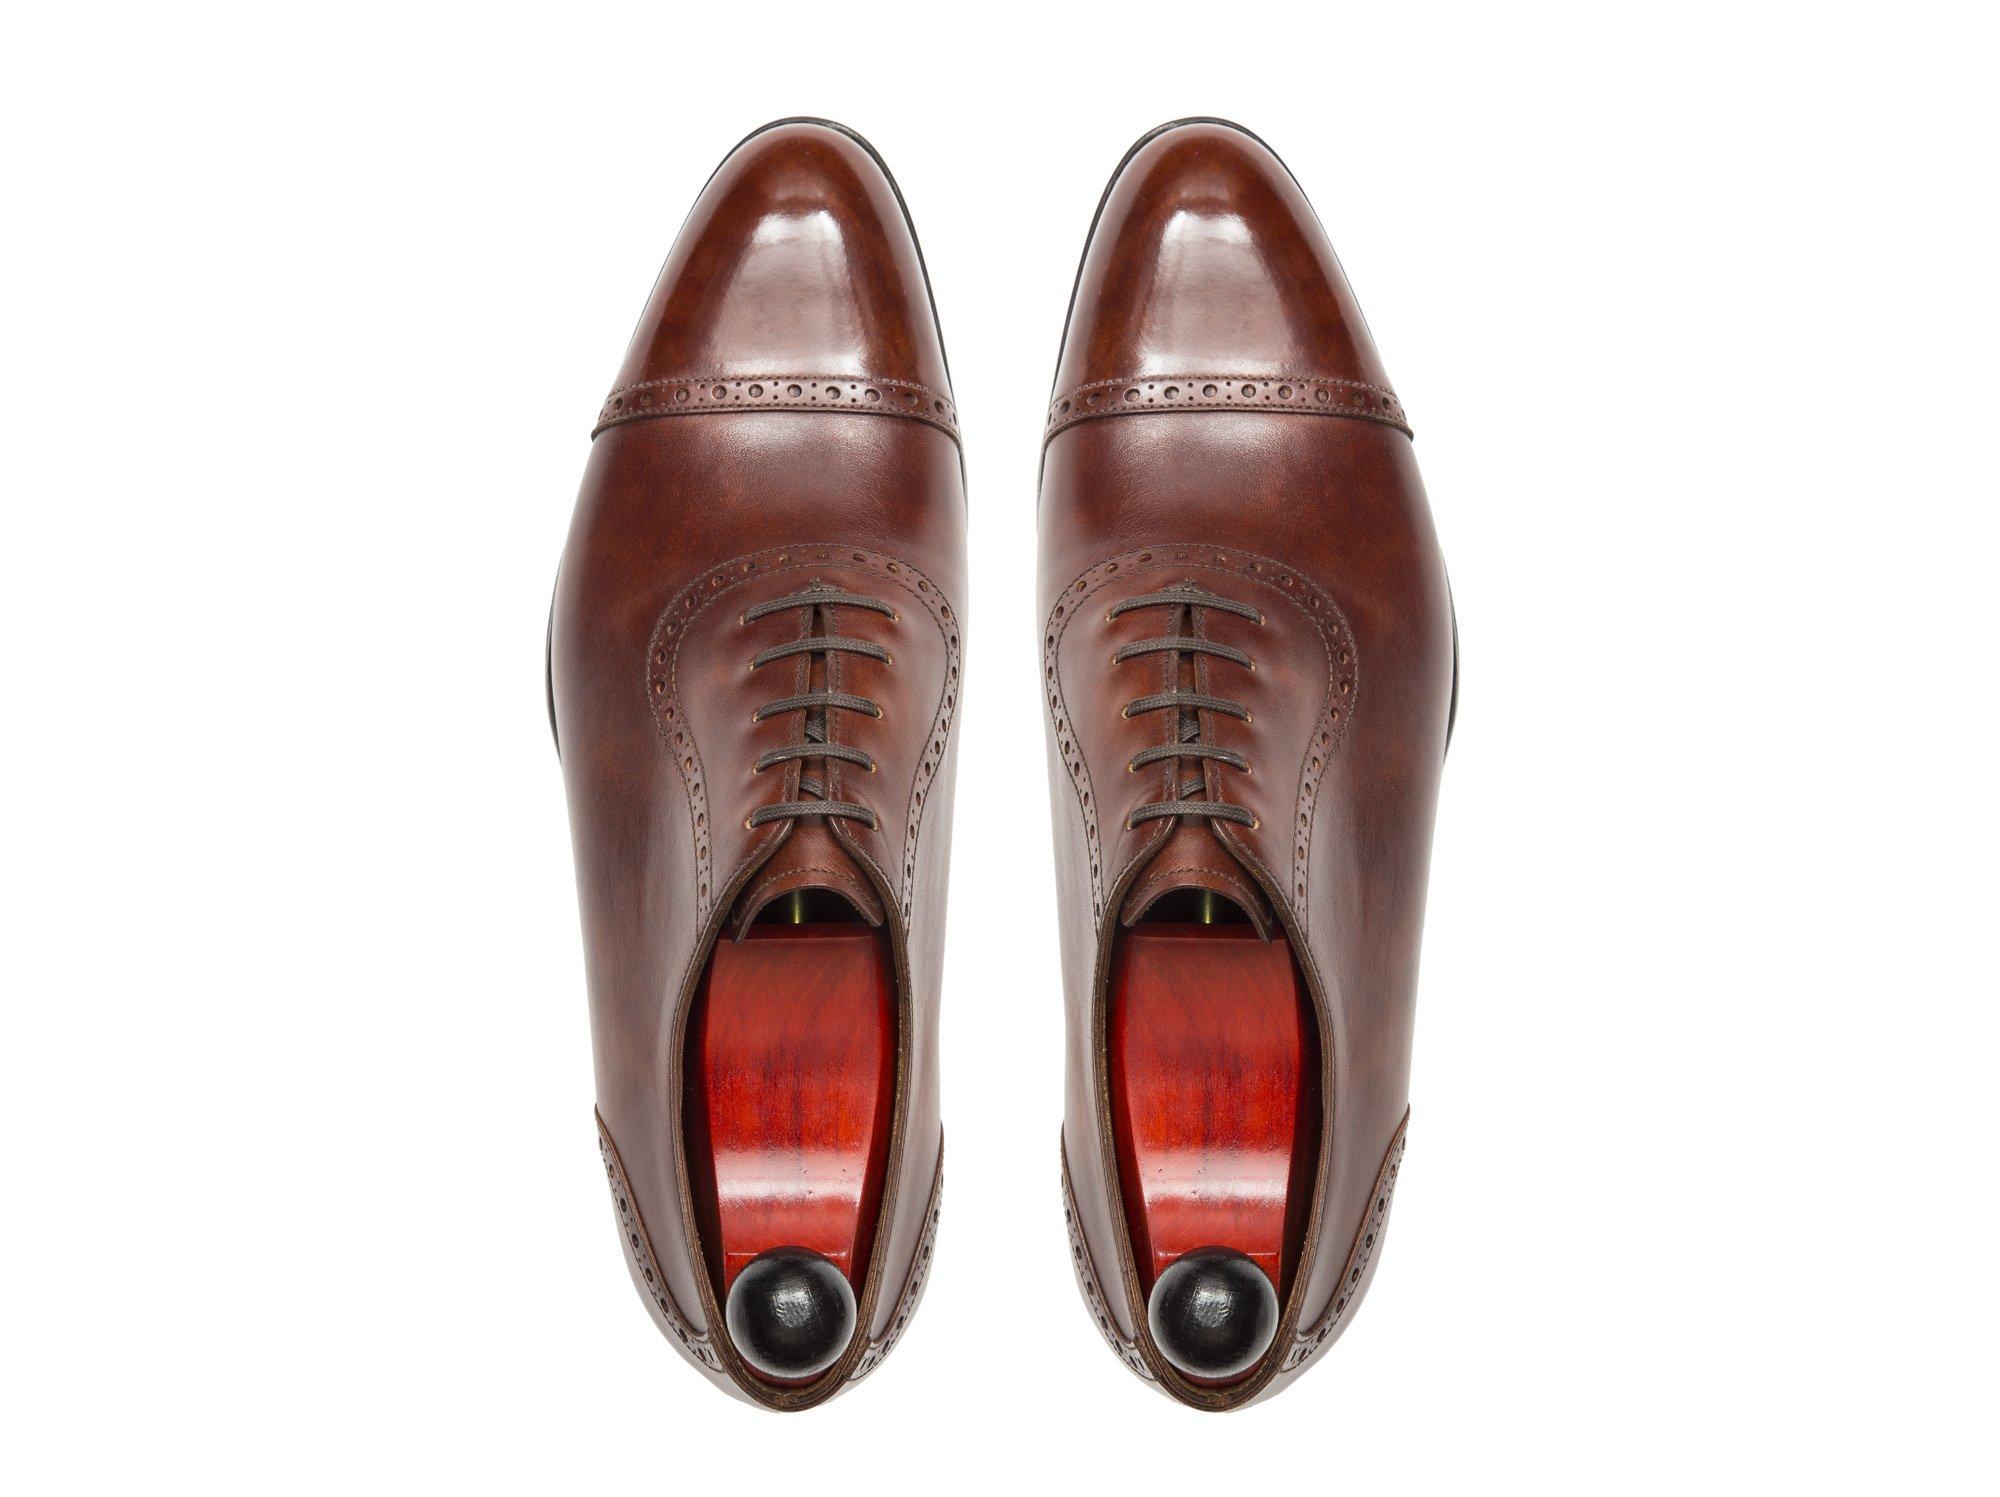 J.FitzPatrick Footwear NGT Last